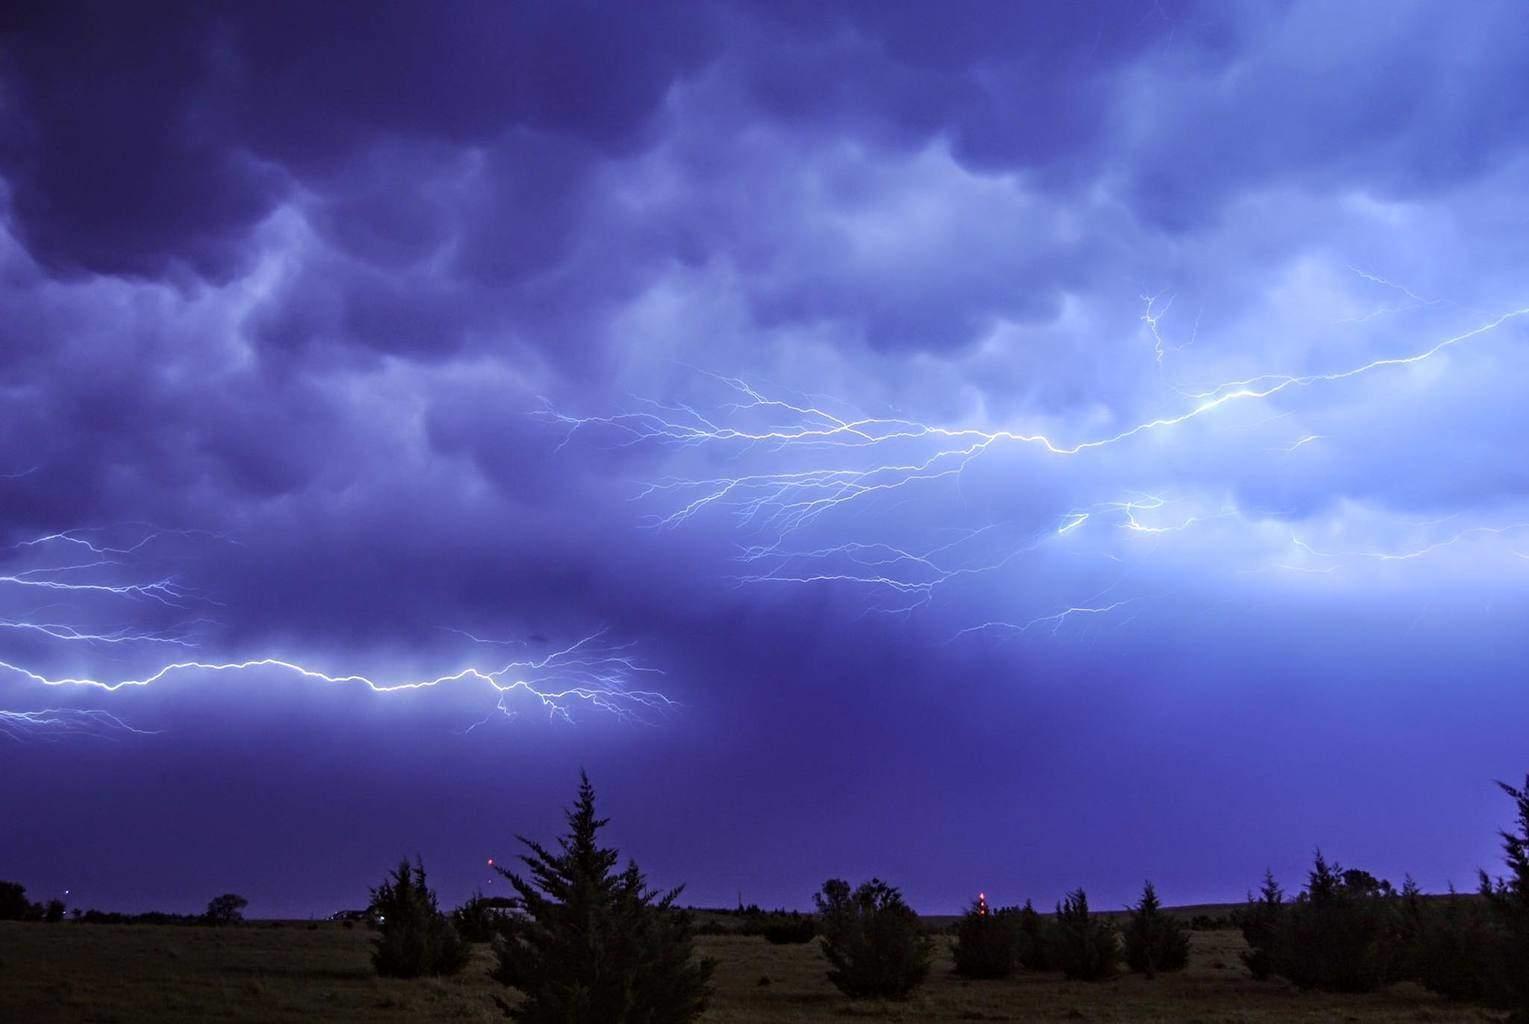 Anvil crawling lightning and mammatus after dark near Bennington, KS on August 31, 2014.